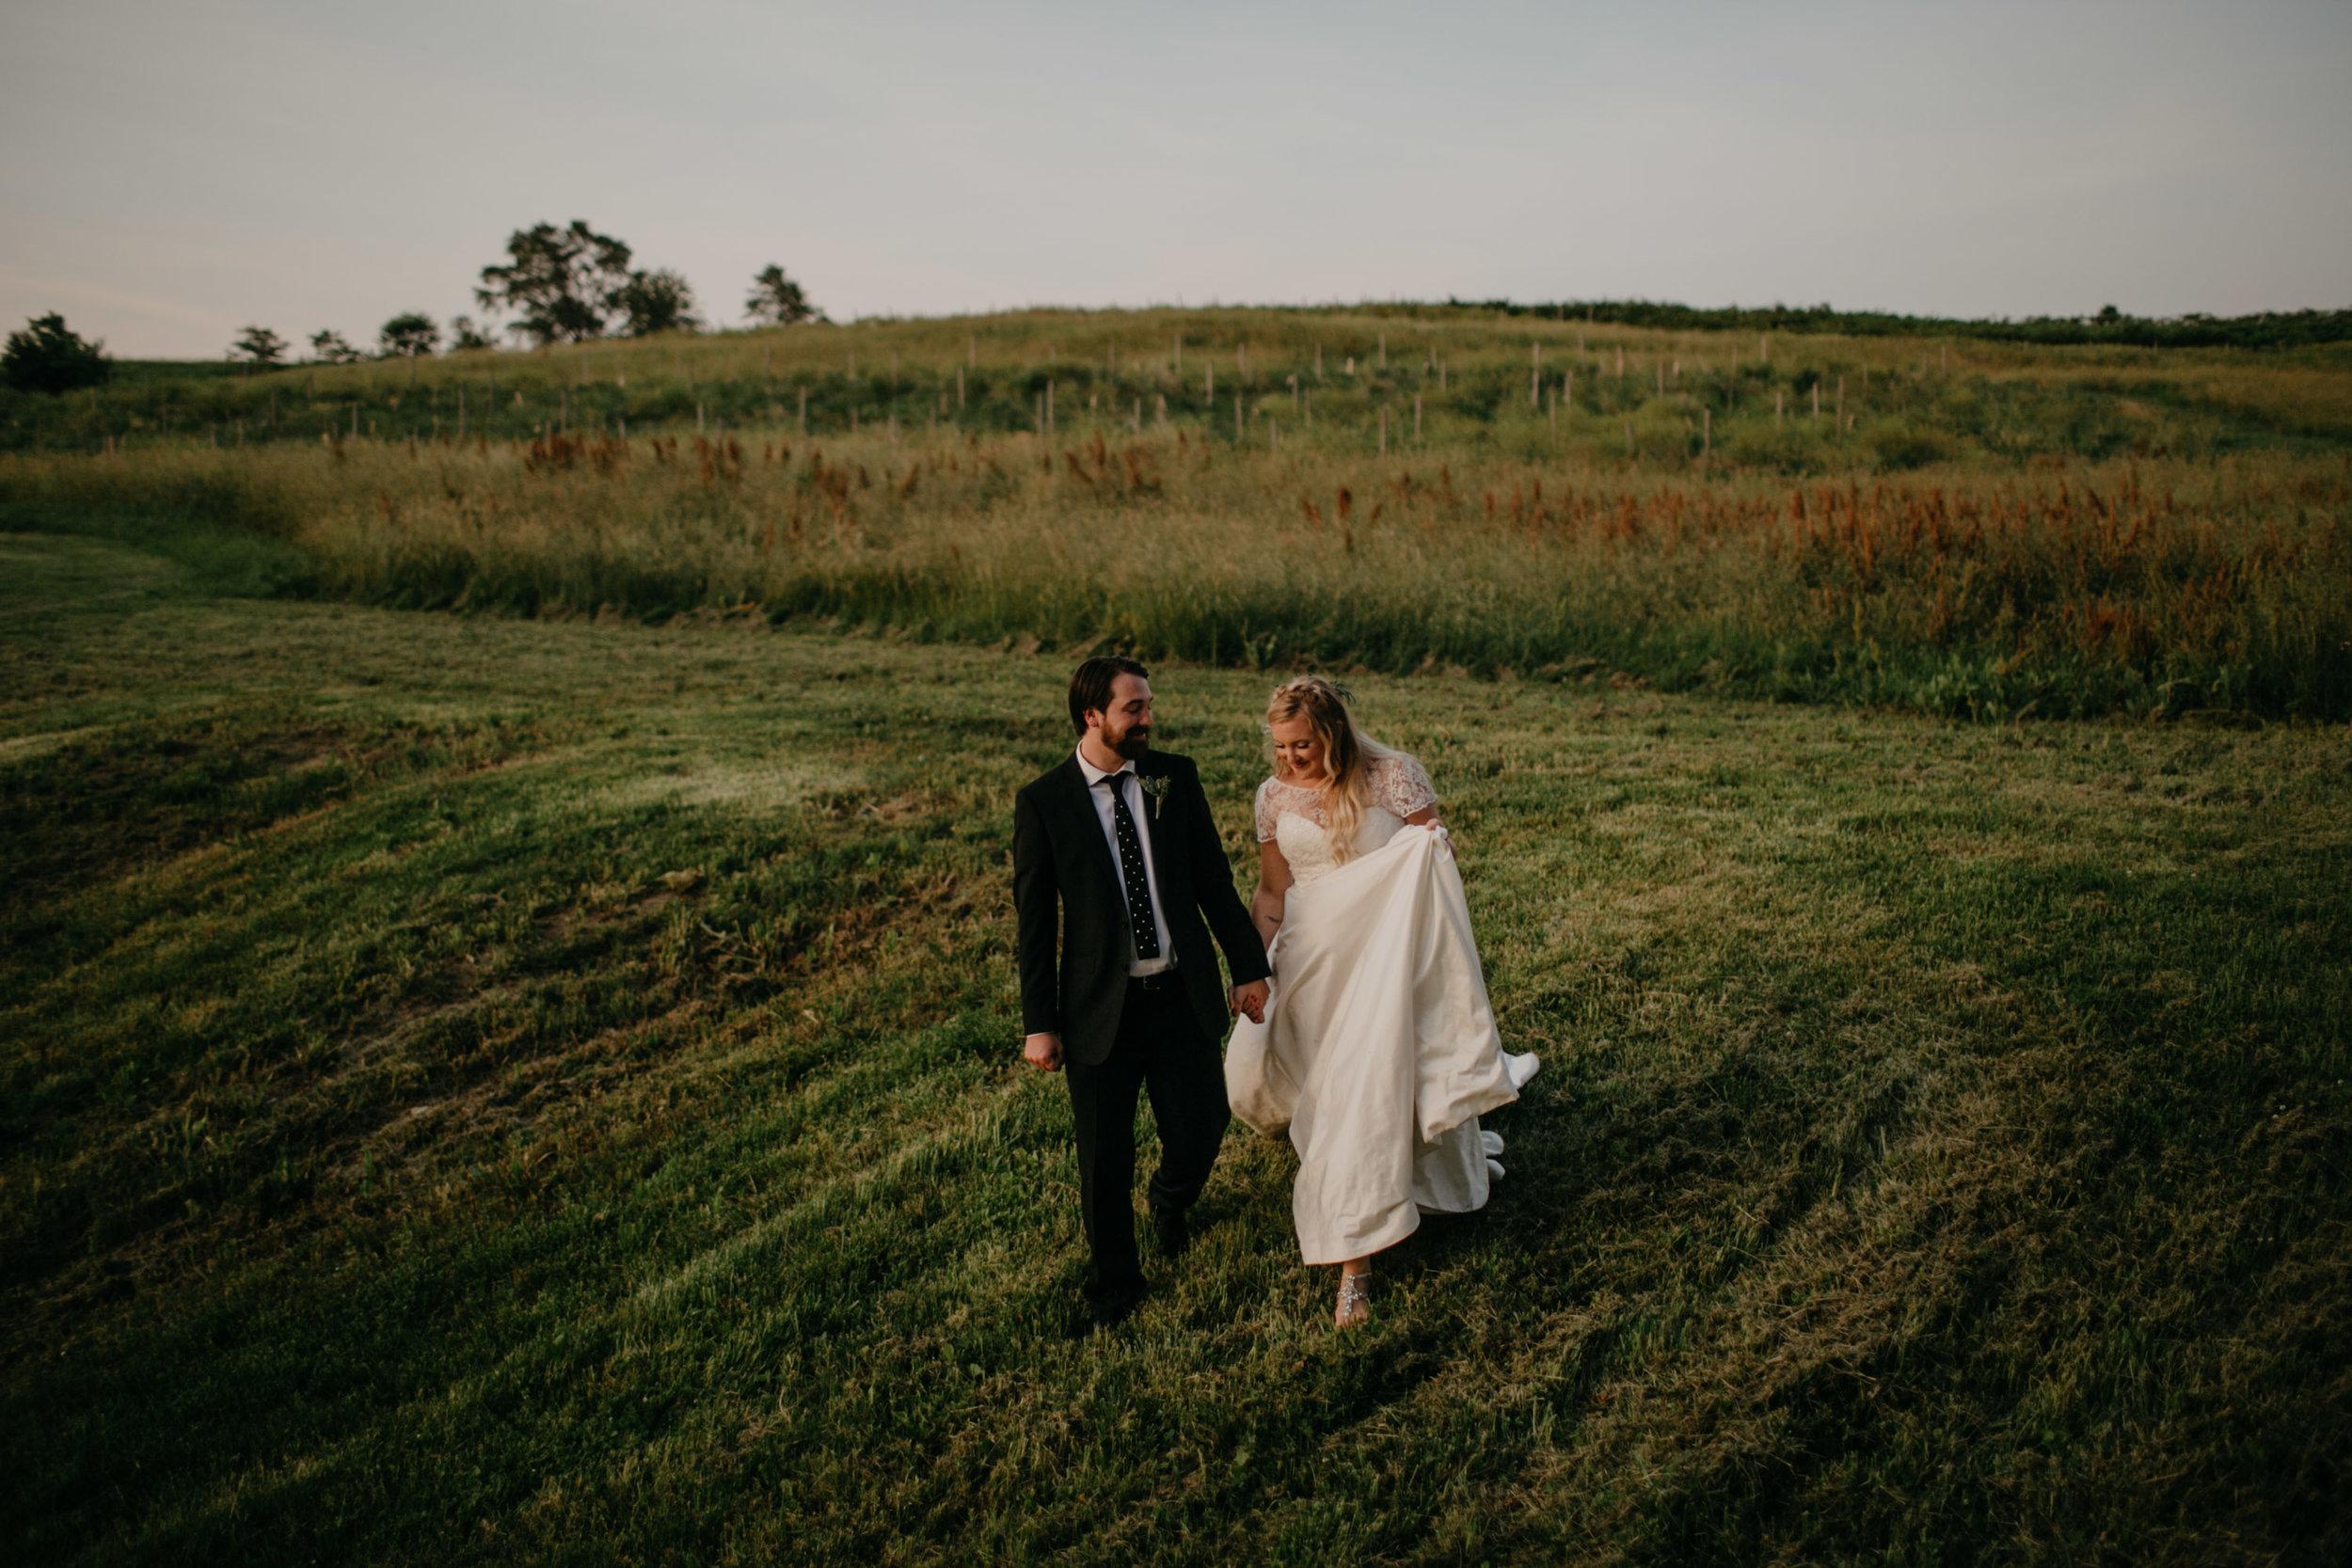 omaha-wedding-photographer_062.JPG